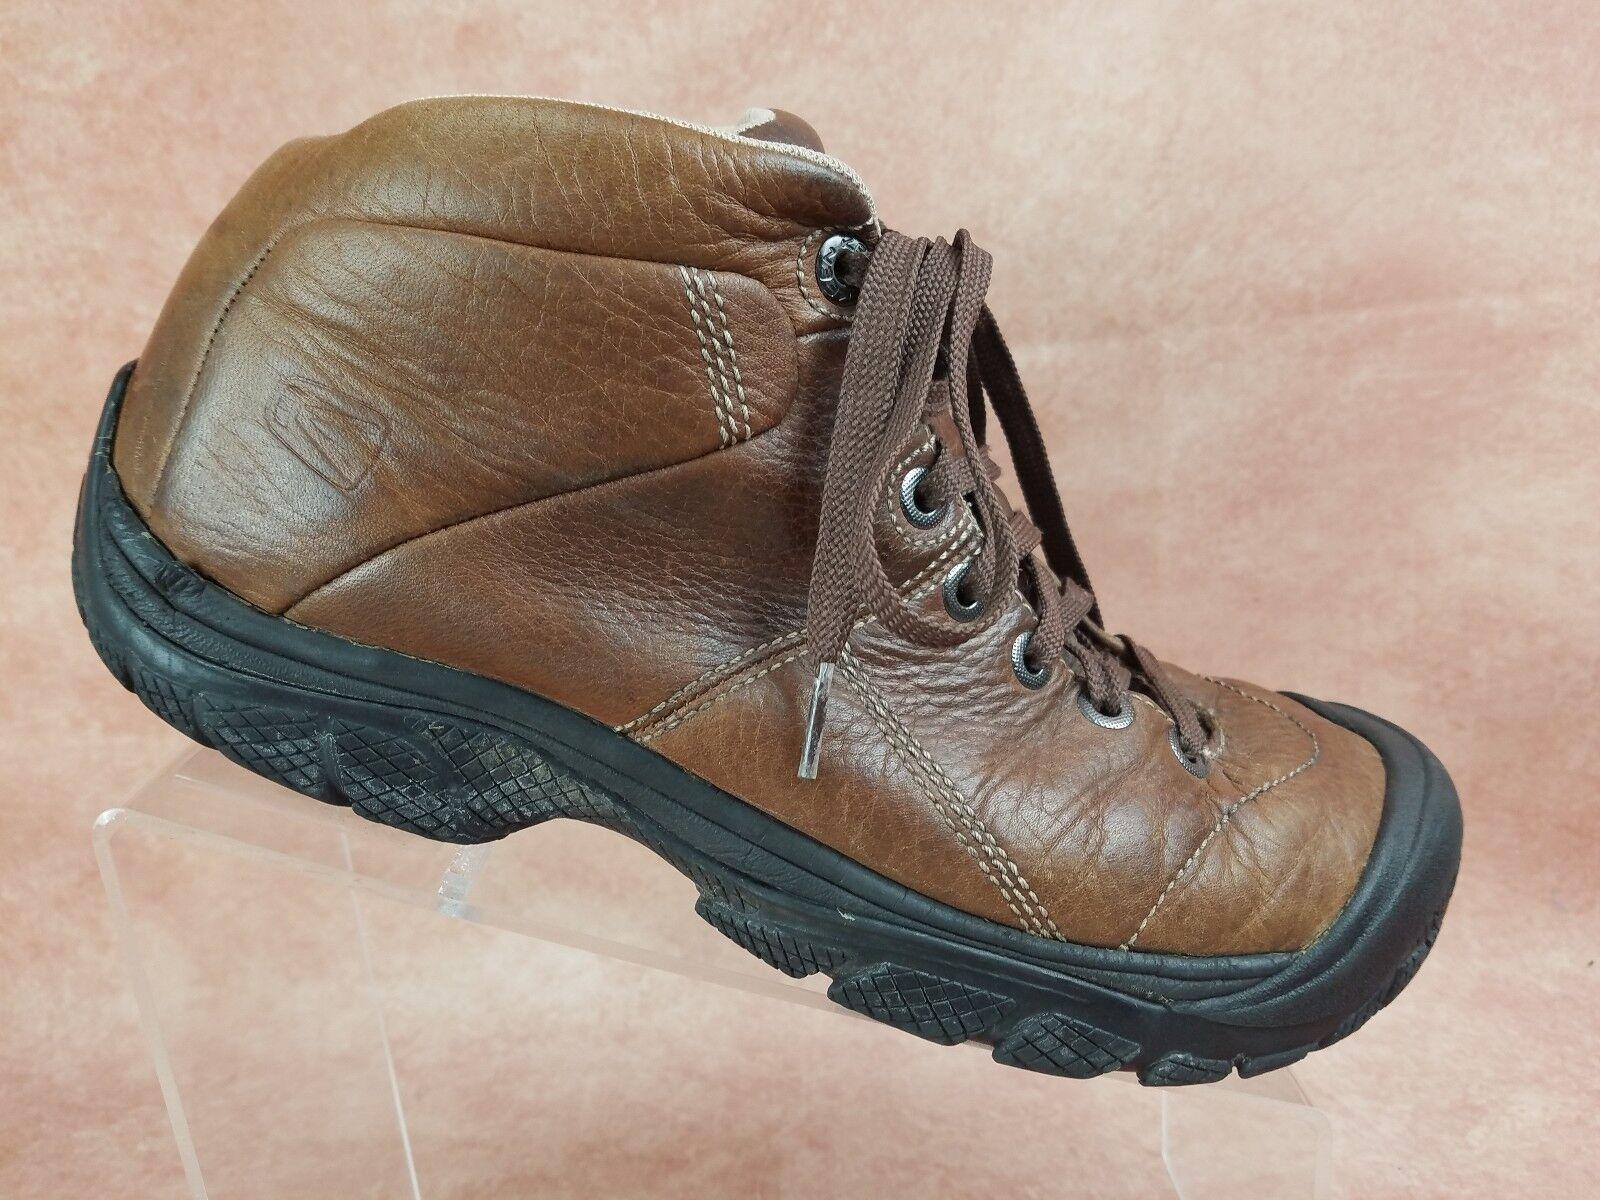 Keen Presidio Brown High Top Men's Size 10.5 Brown Presidio Leather Hiking Boot a6199c